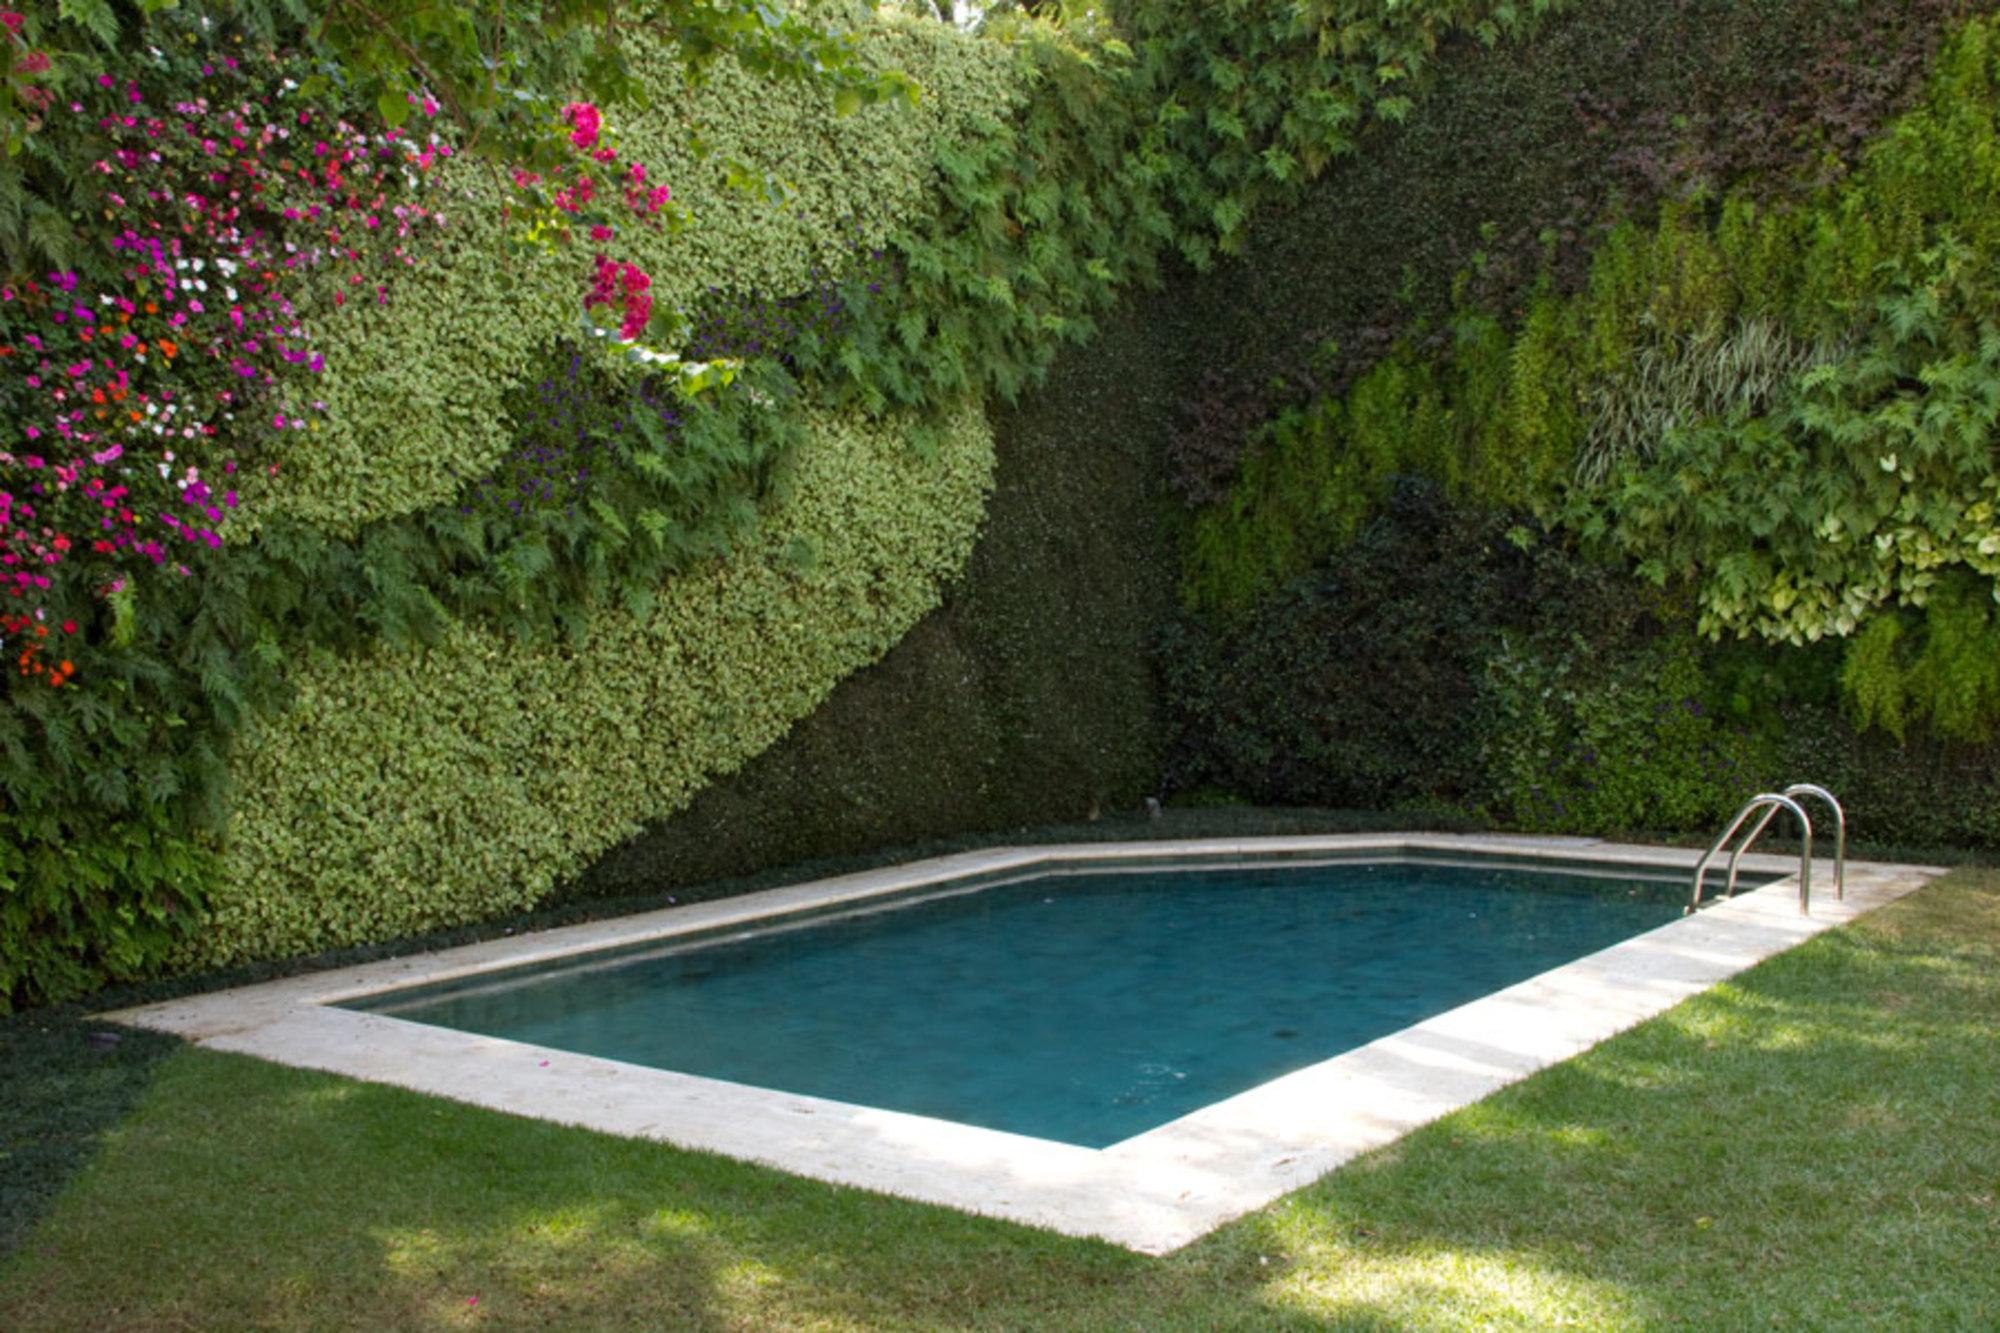 jardim vertical no muro : jardim vertical no muro:JARDIM VERTICAL EXUBERANTE